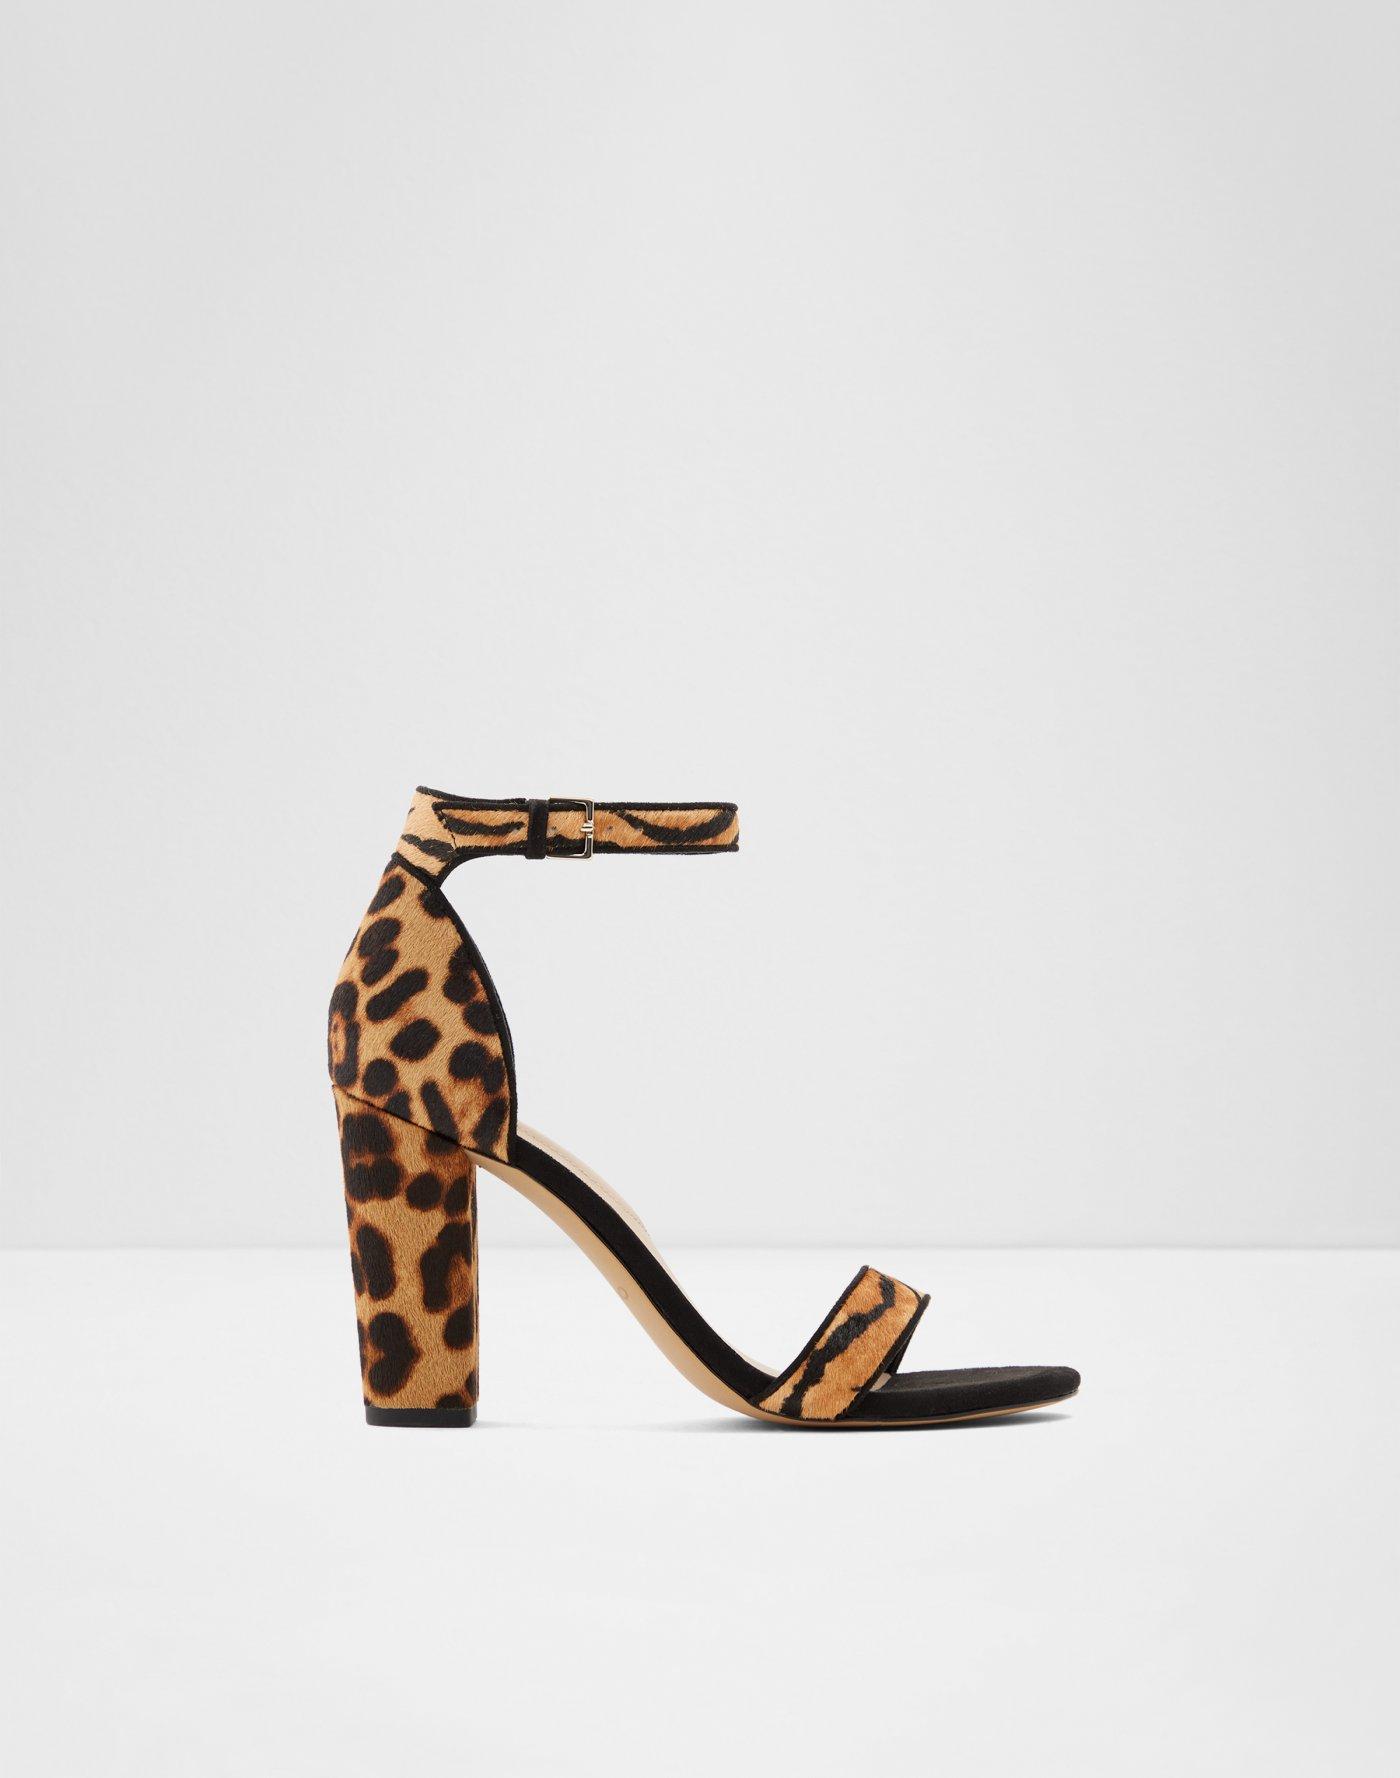 bdee176e2 Sandals for Women | Slides & Gladiator Sandals | ALDO US | Aldoshoes.com US